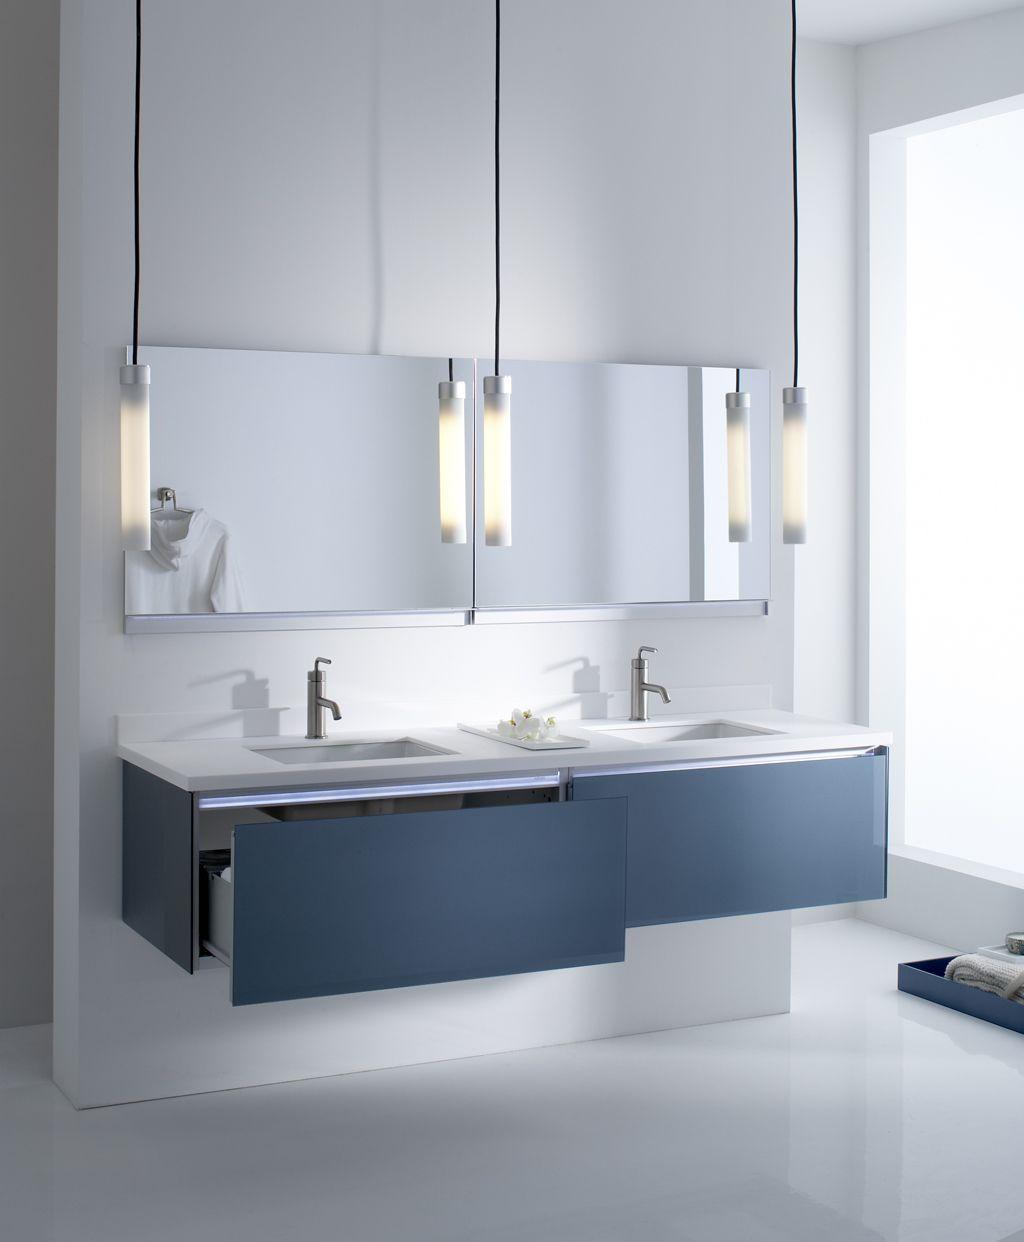 floating bathroom cabinets | sunshine canyon | Pinterest | Bathroom ...